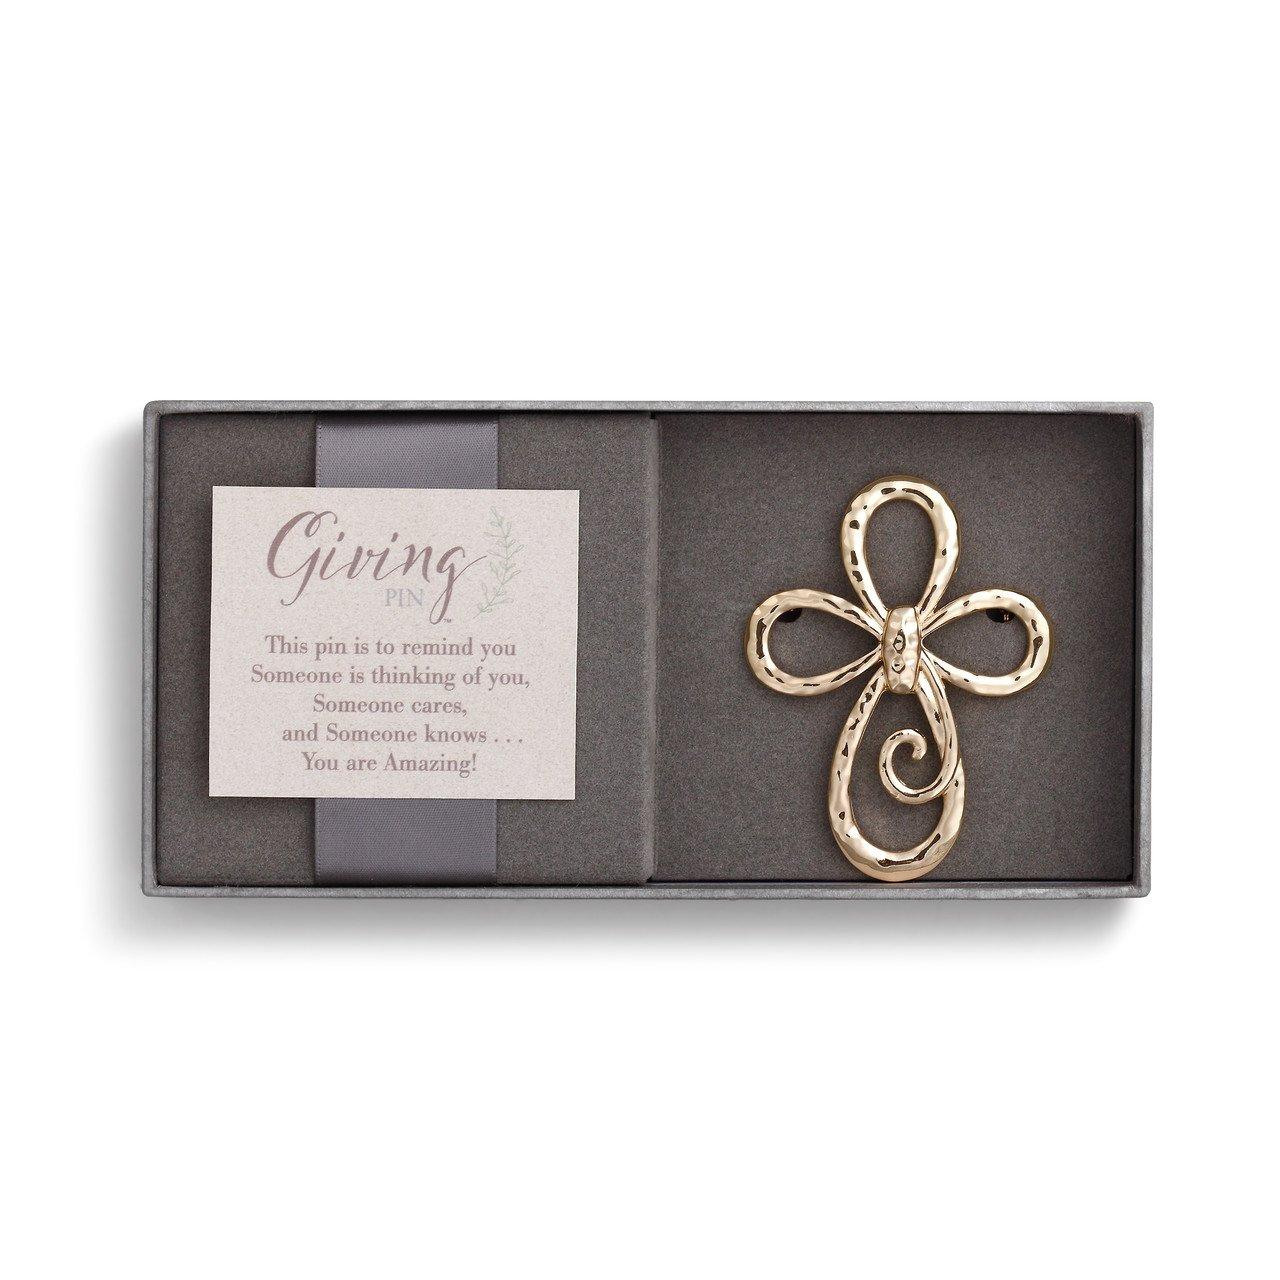 Demdaco Loop Cross Goldtone Hammered One Size Women's Metal Giving Pin in Gift Box